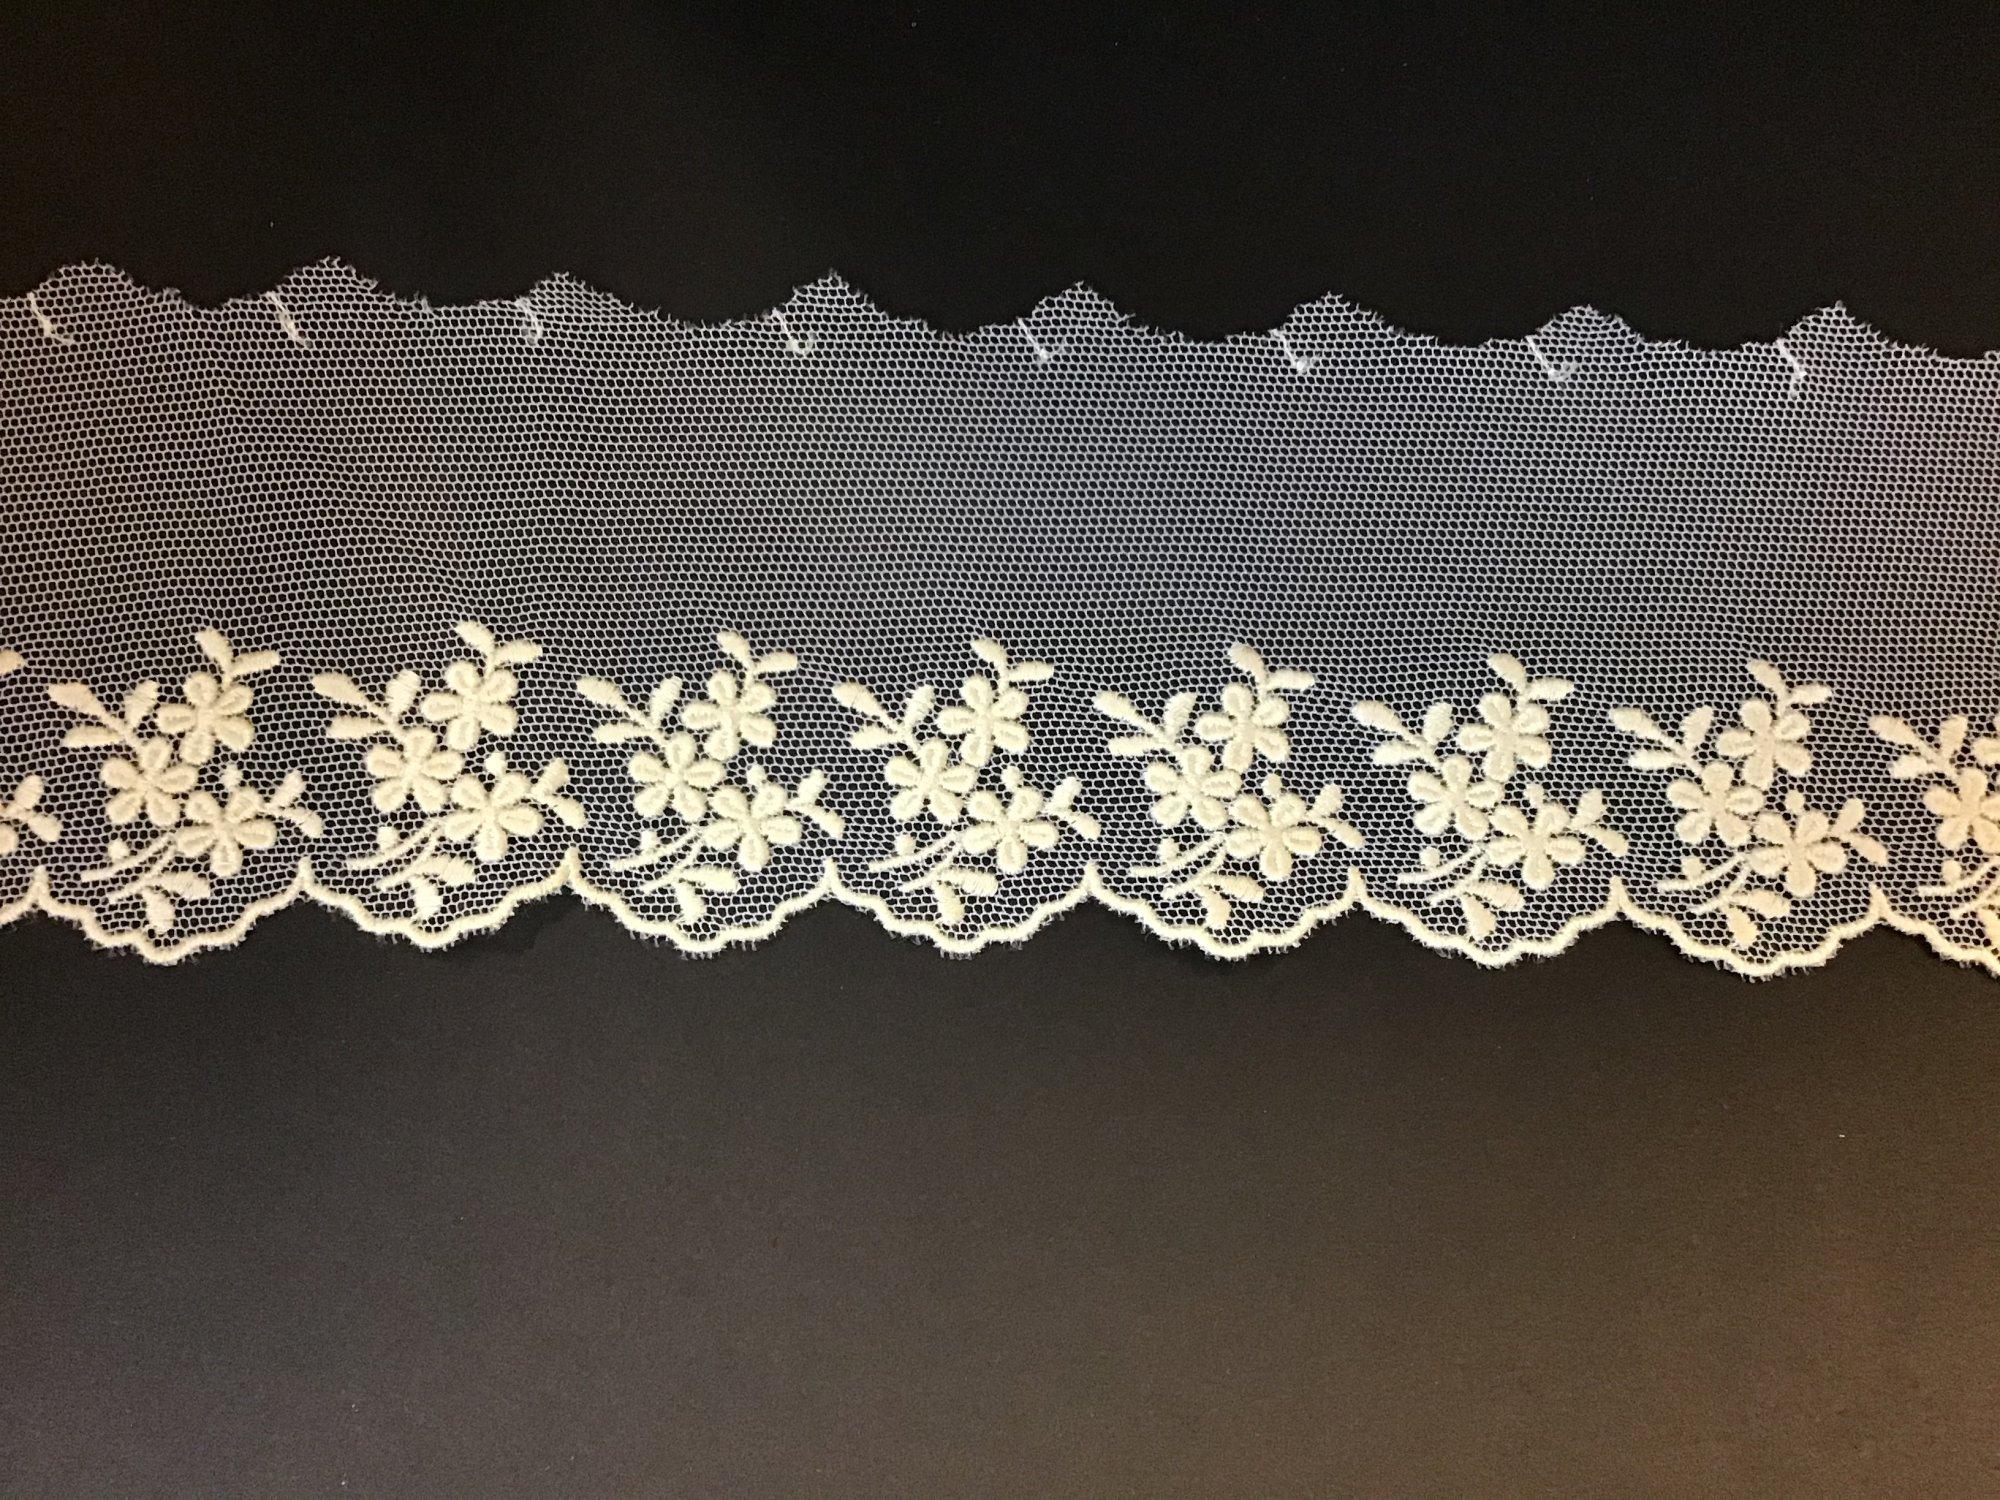 English Netting Lace Edging 2.25 Inches Ecru 717438-C